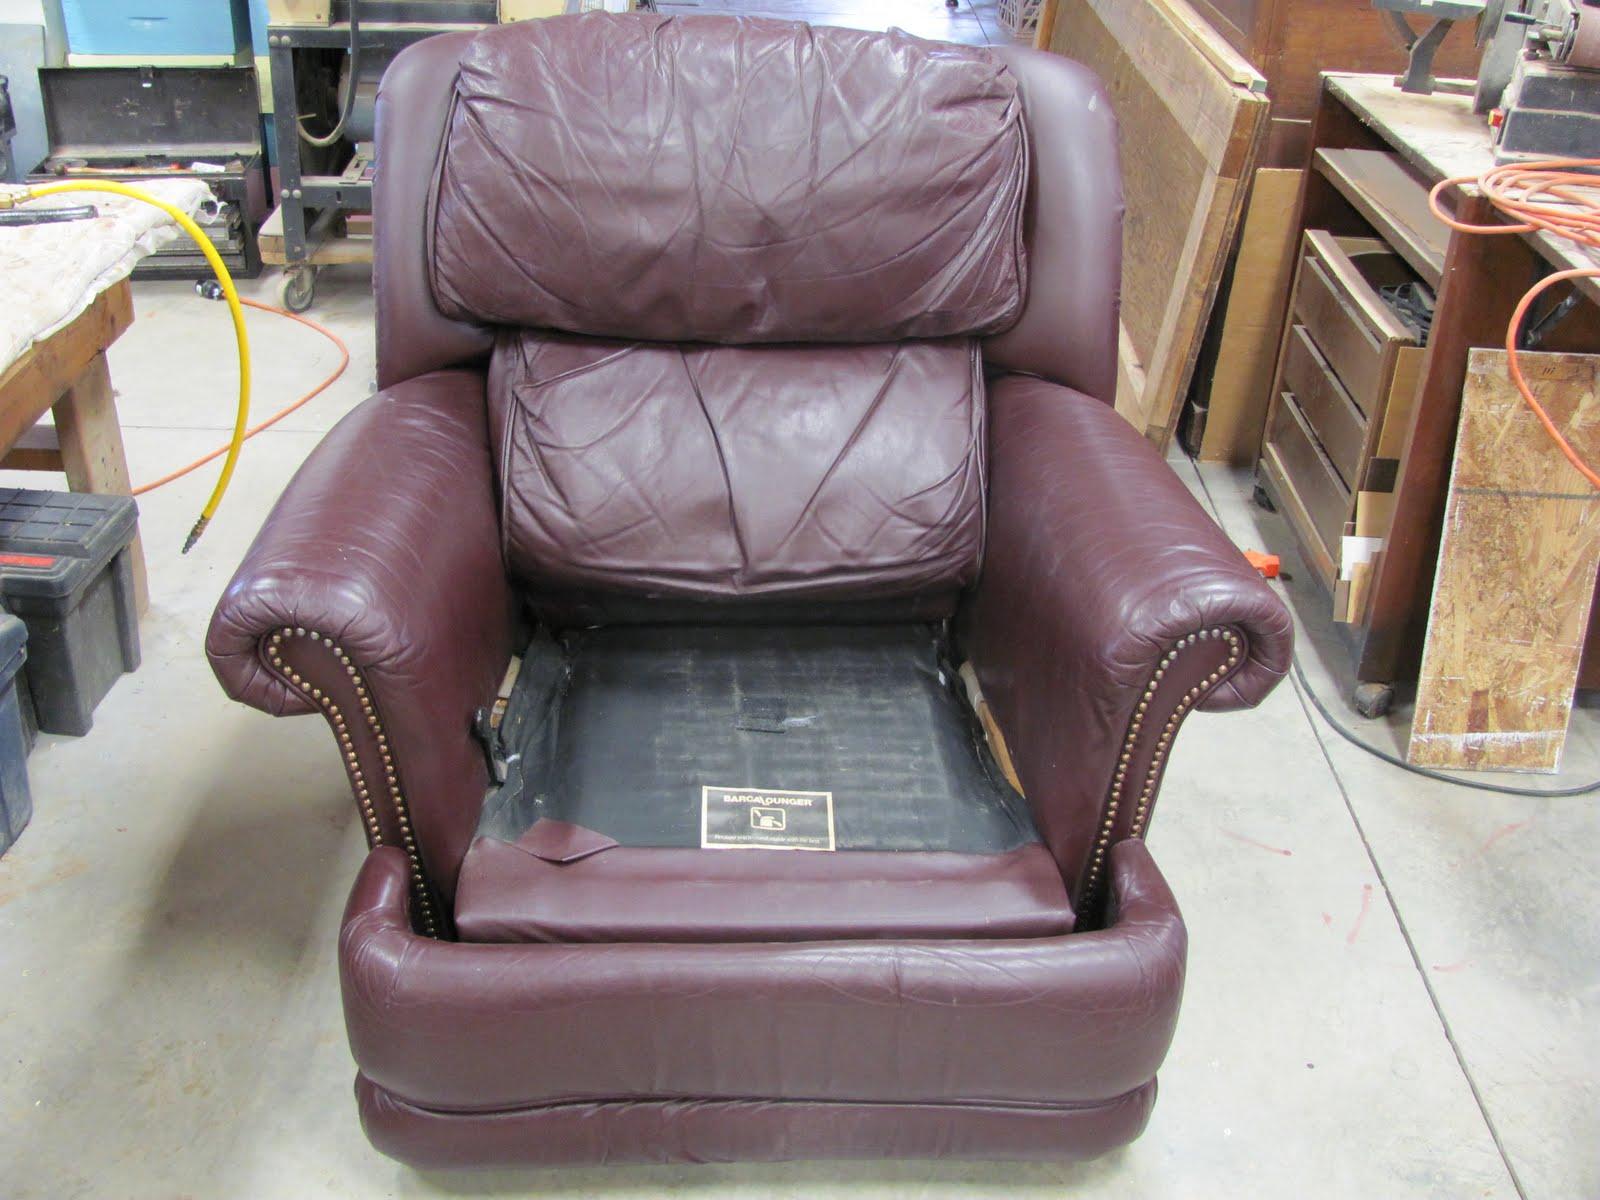 Recliner Chair Handle Broken Orange Adirondack Chairs Thomas Nelson Furniture Restoration Arm